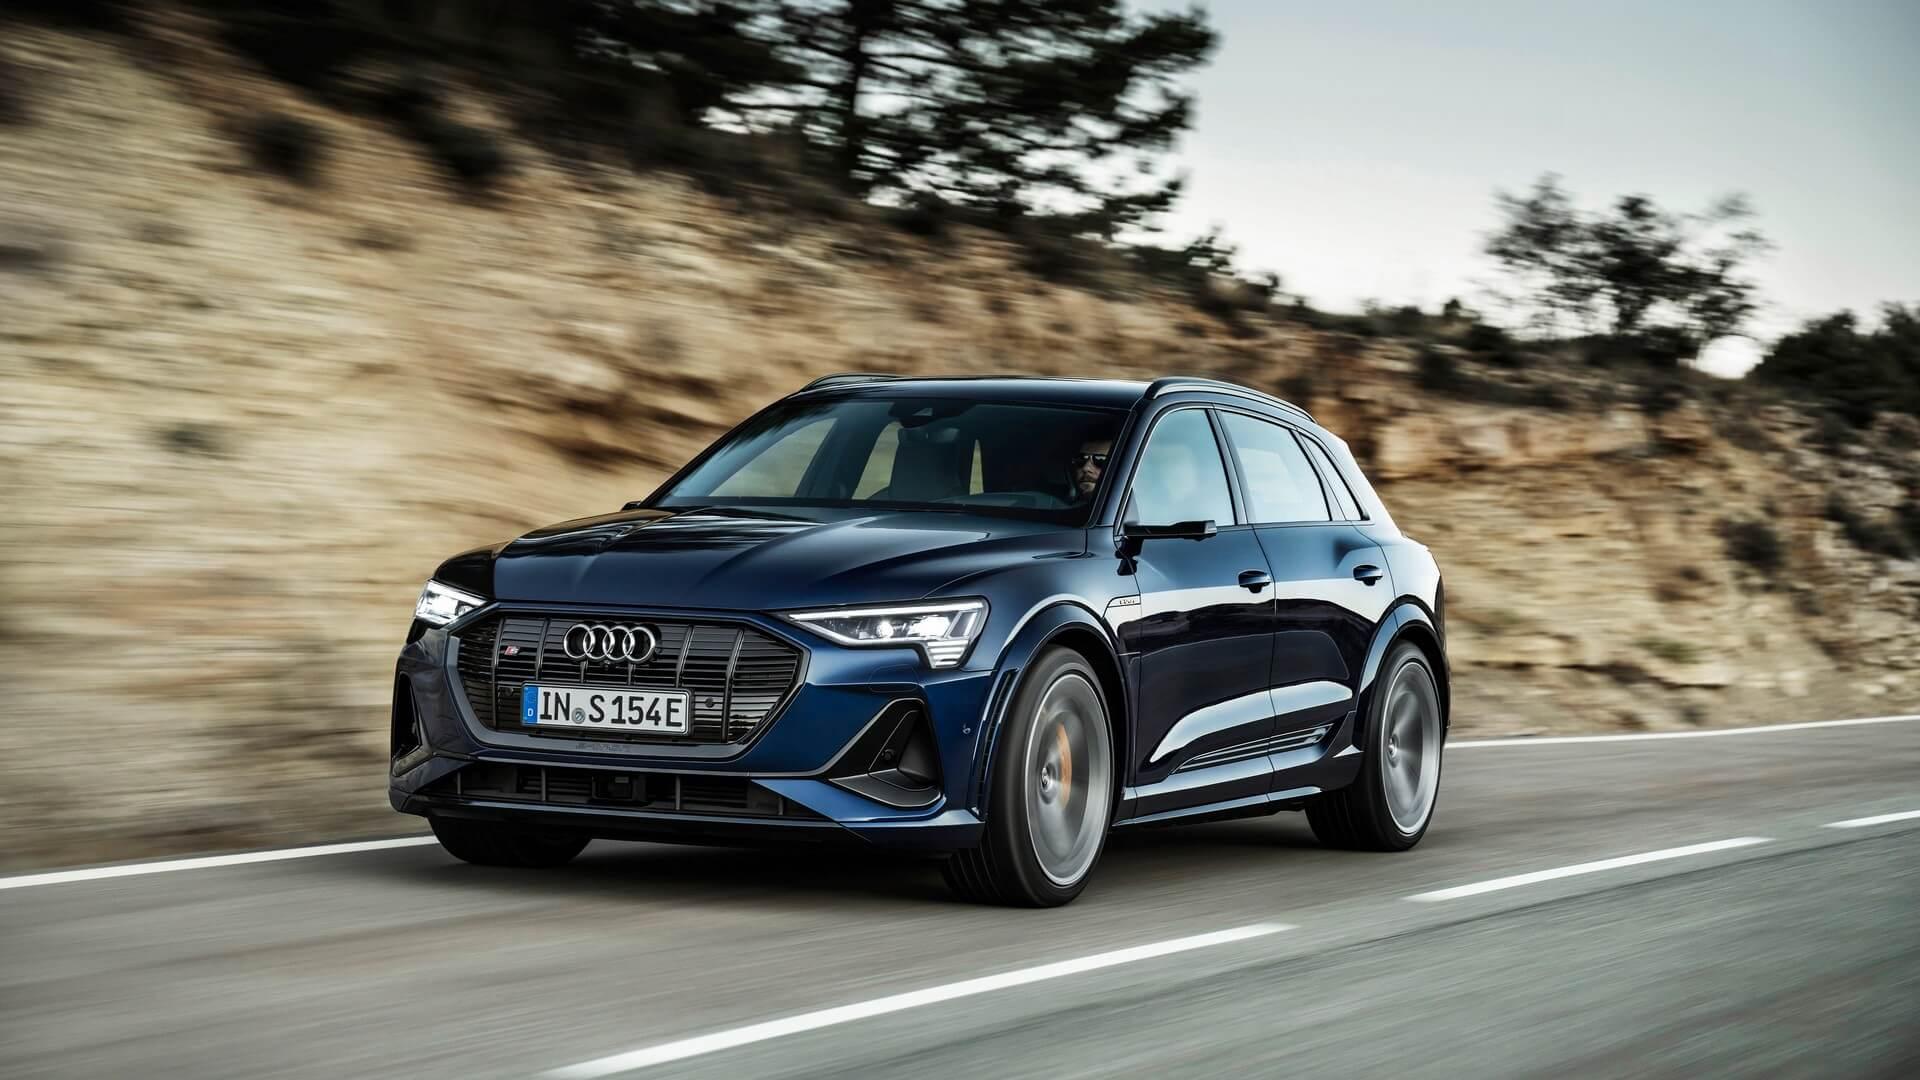 Audi-E-Tron-S-and-E-Tron-S-Sportback-2020-3